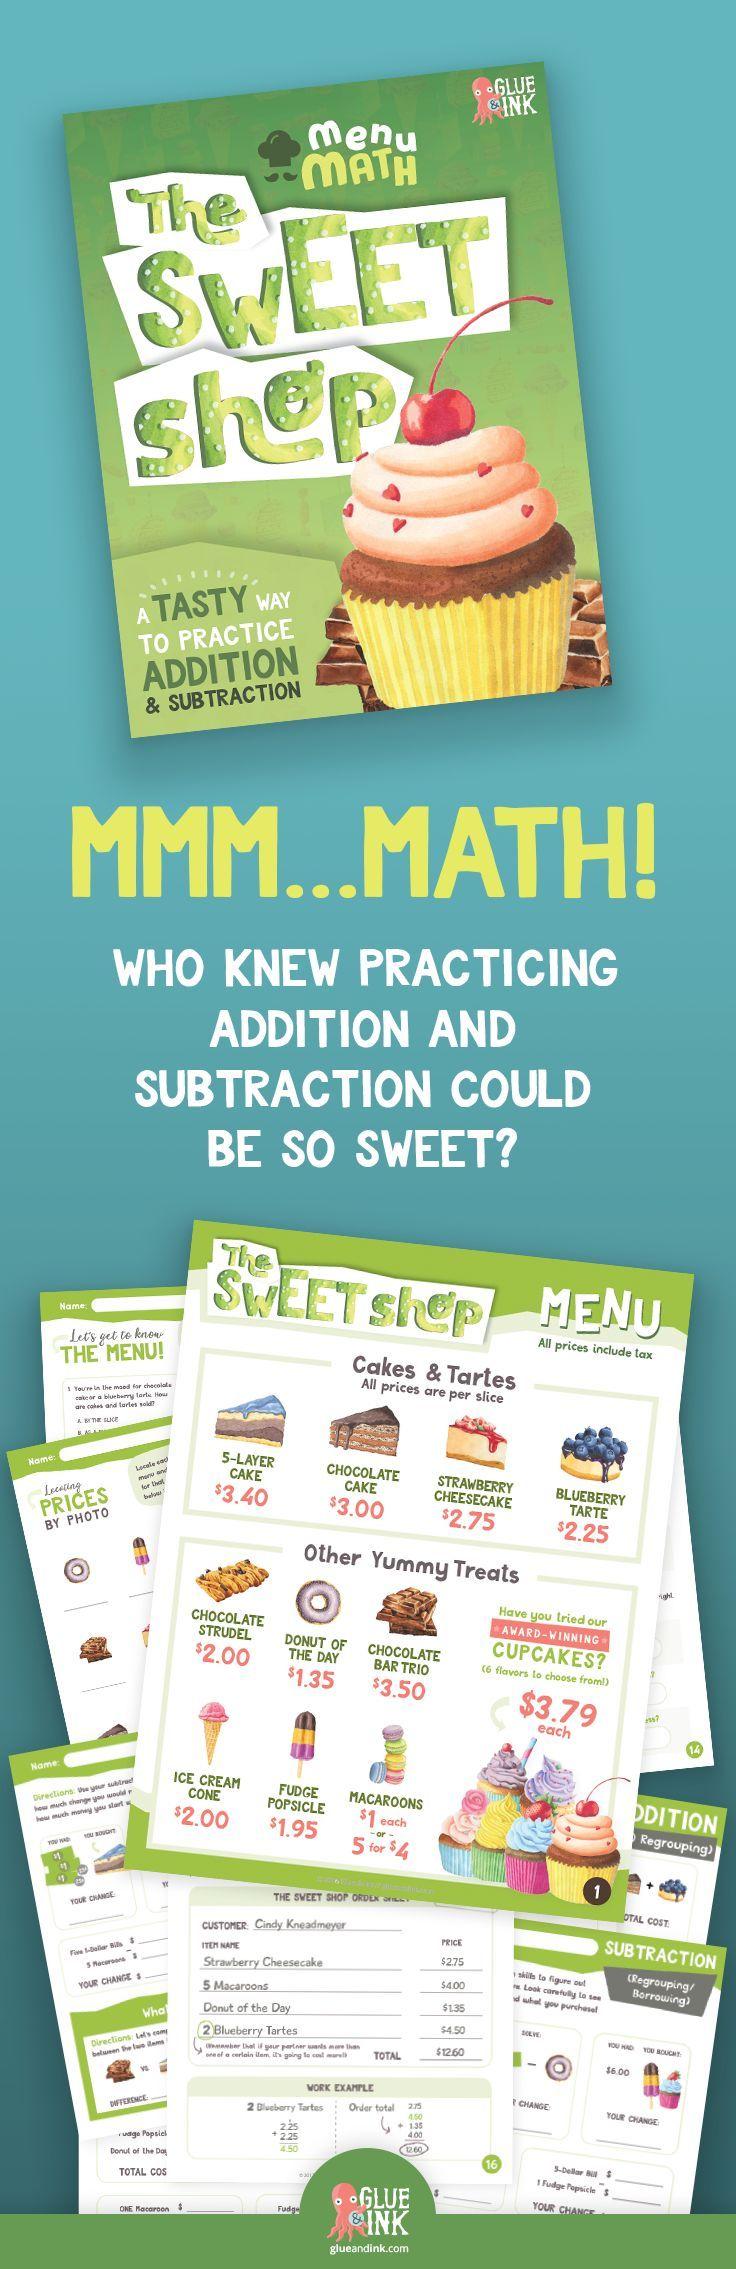 The Sweet Shop Menu Math – Addition & Subtraction | Math addition ...